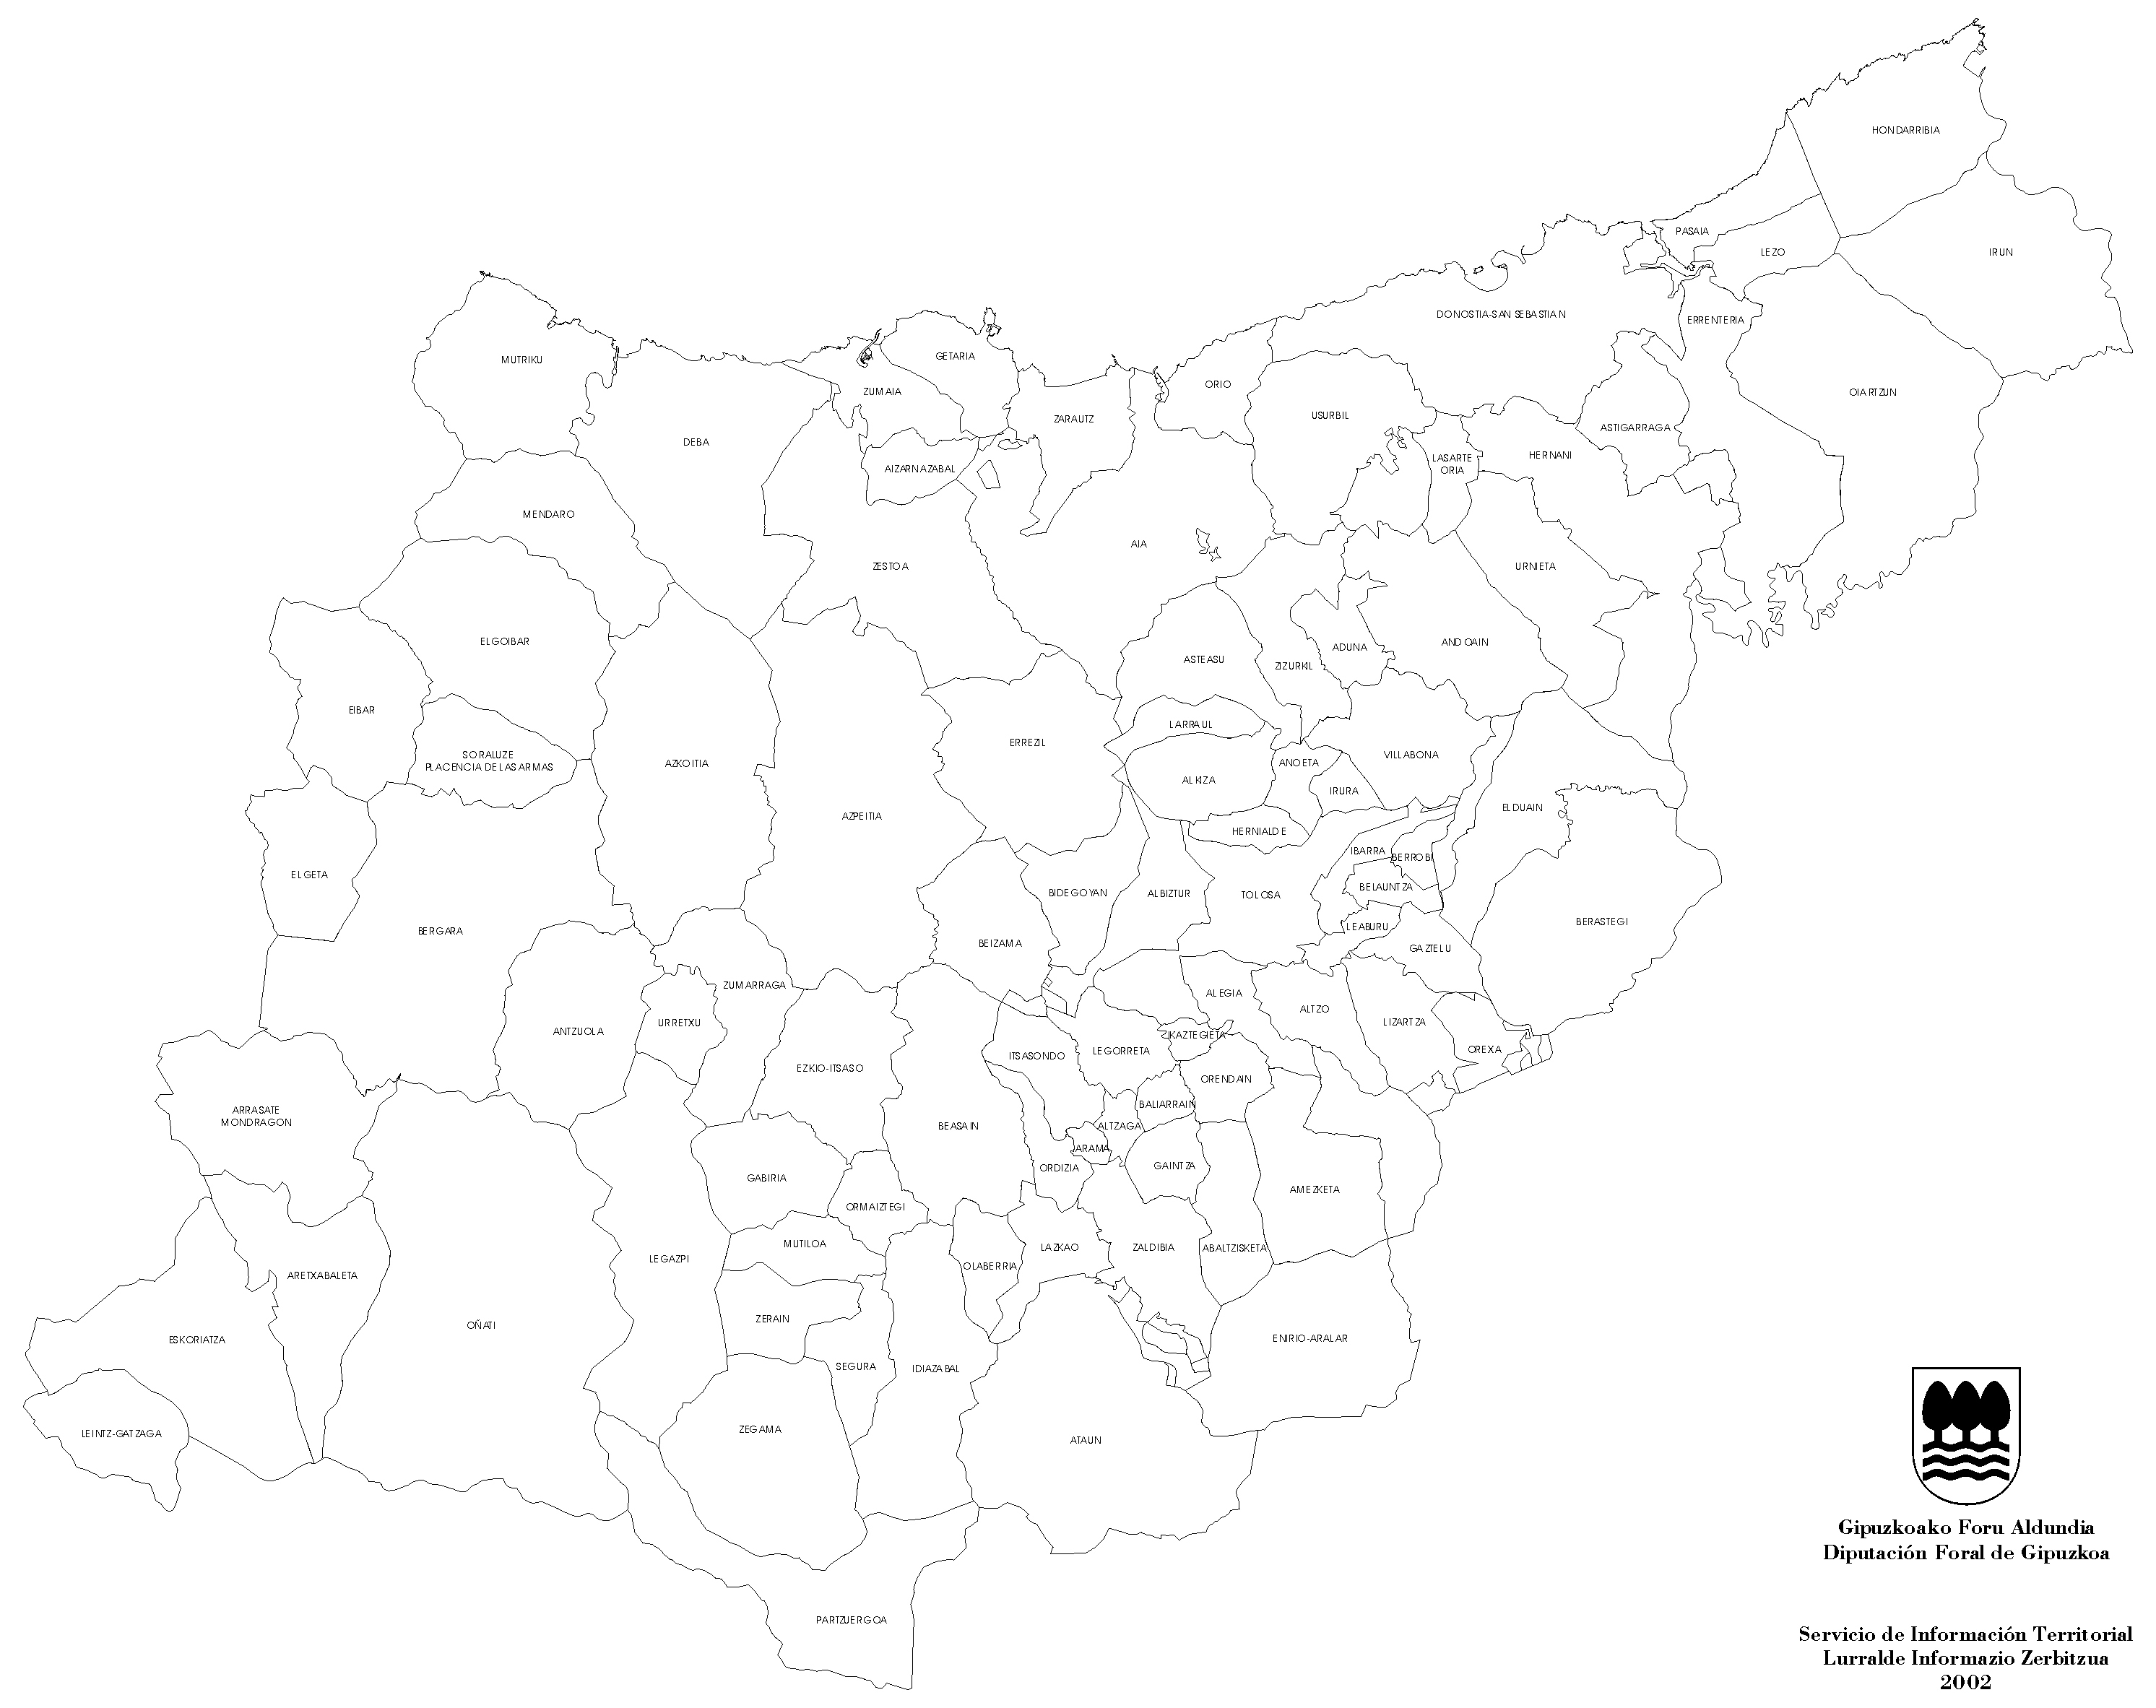 Municipios y mancomunidades de Guipúzcoa 2002